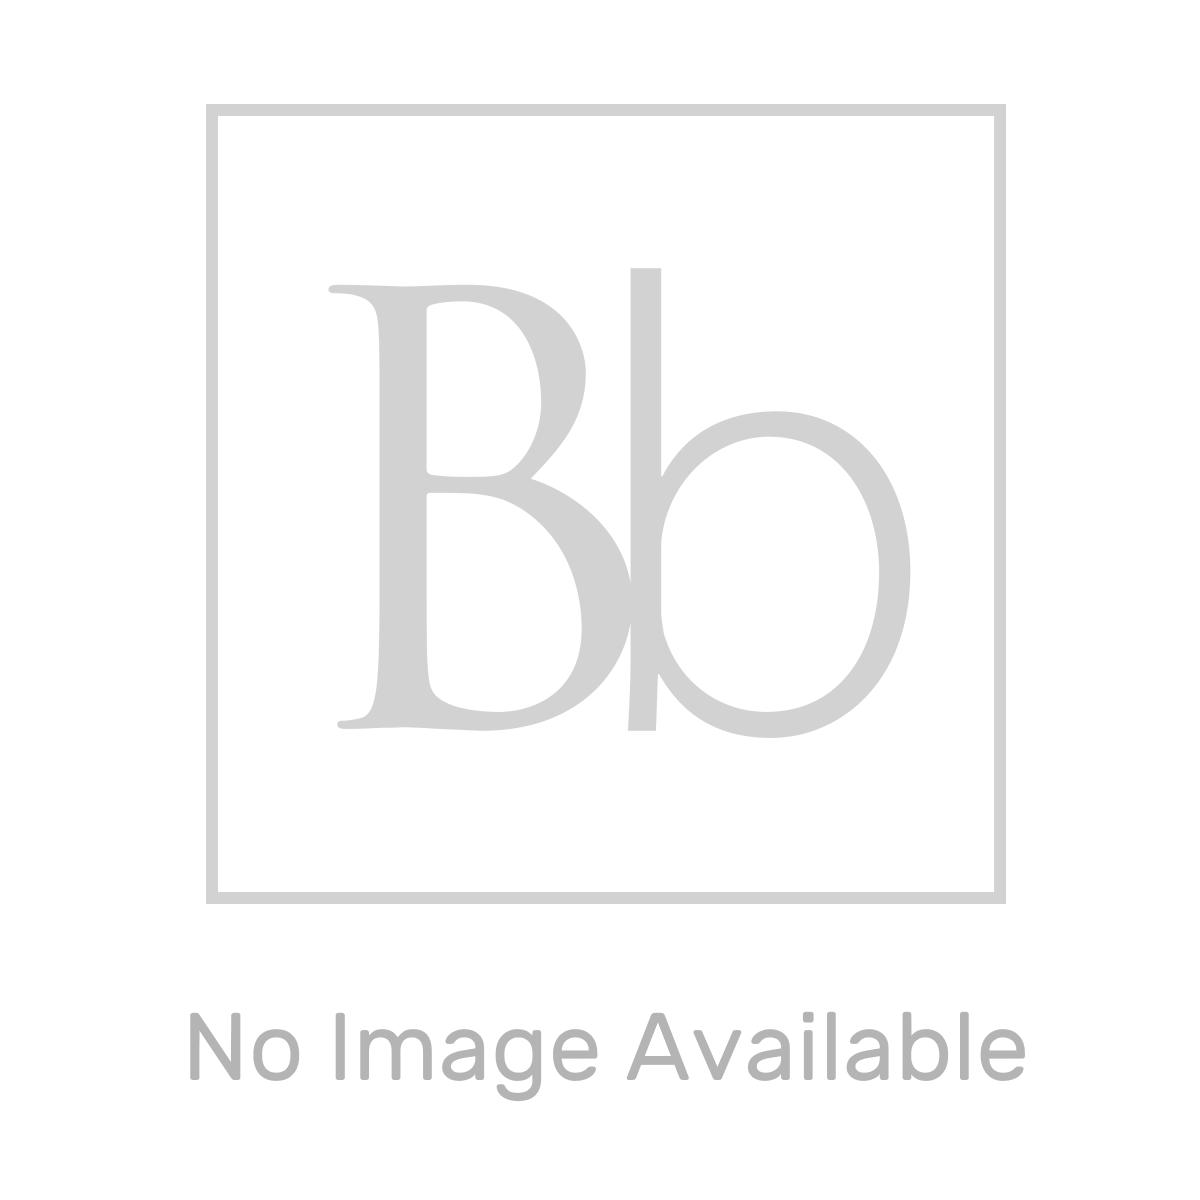 Zenith Epic Bath Filler Tap Lifestyle